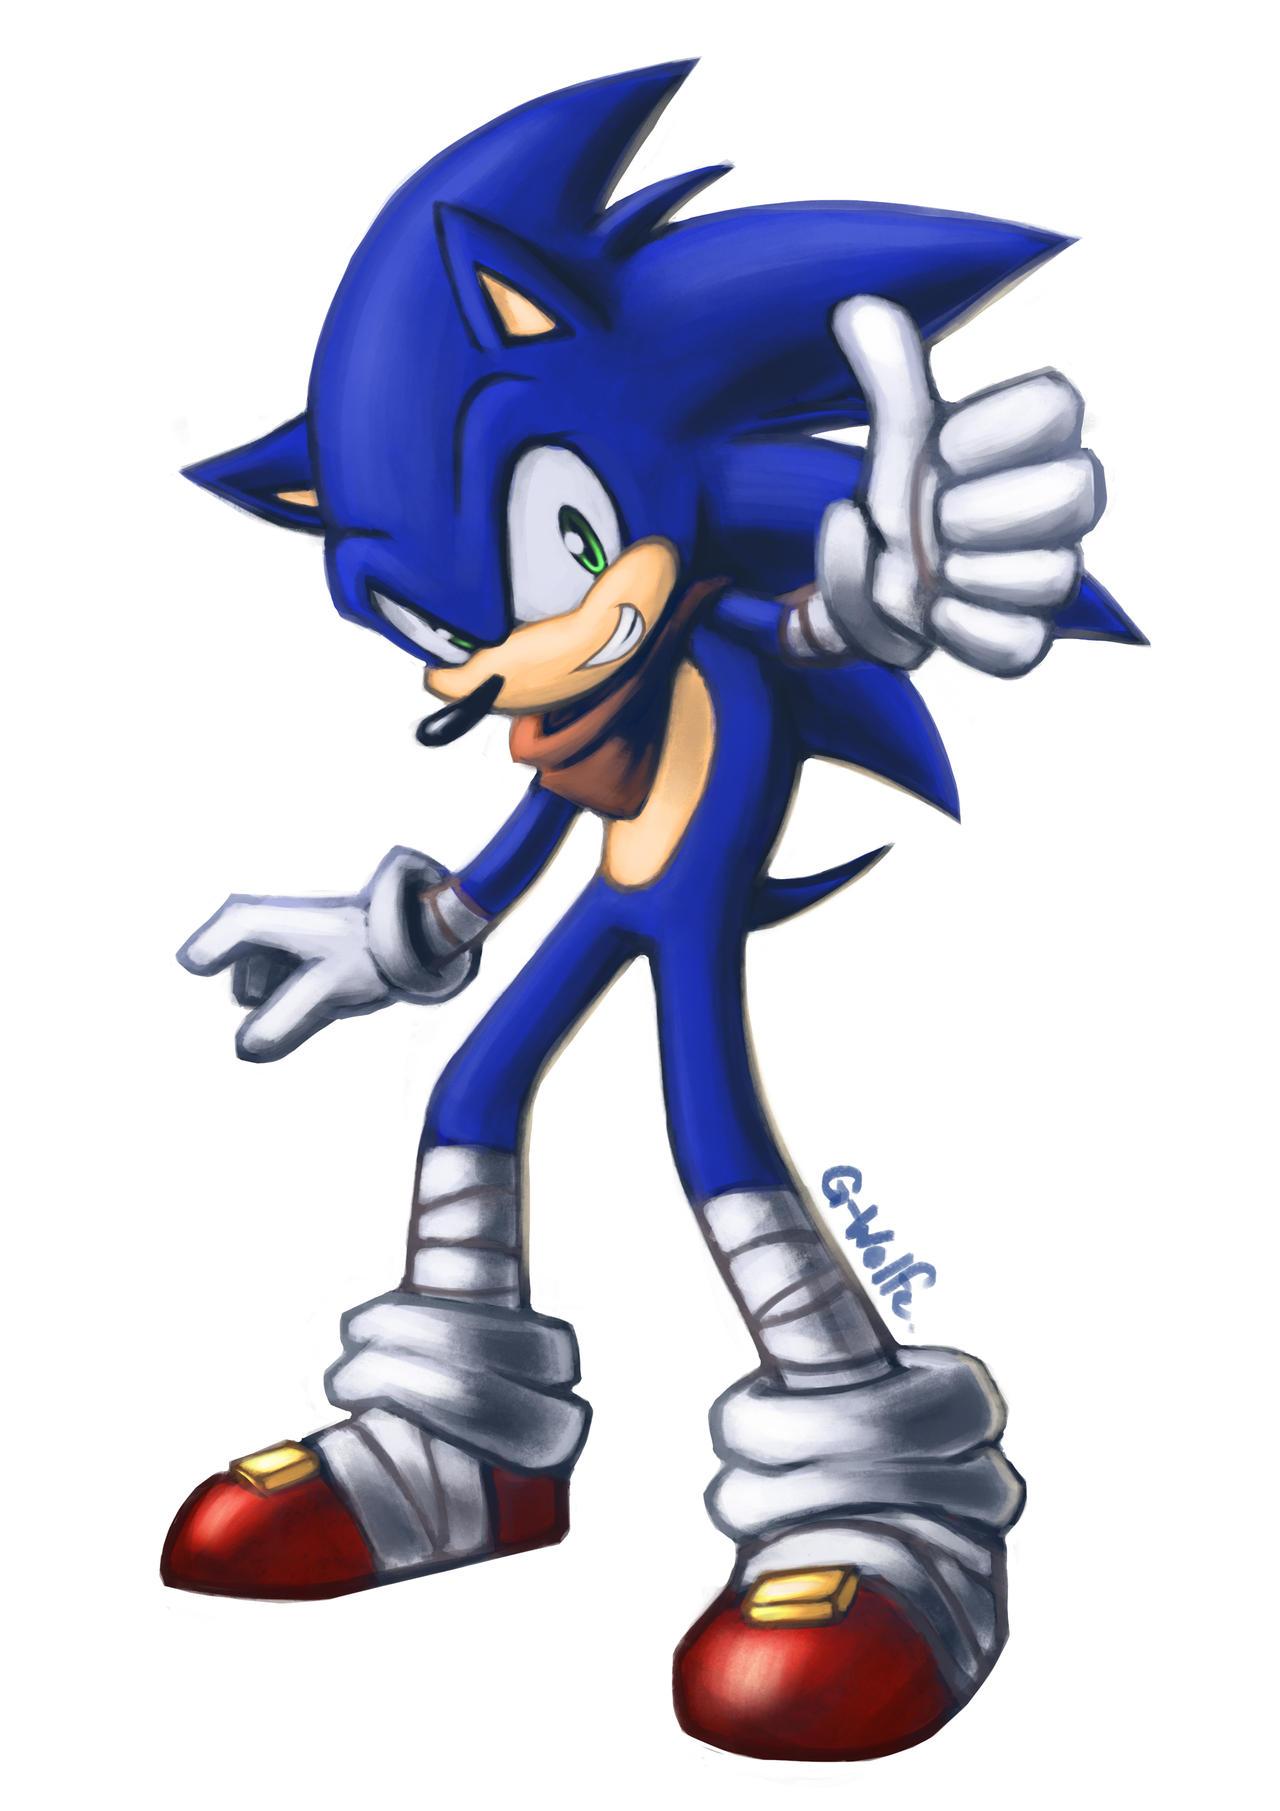 Sonic boom by g wolfe on deviantart - Sonic boom shadow ...